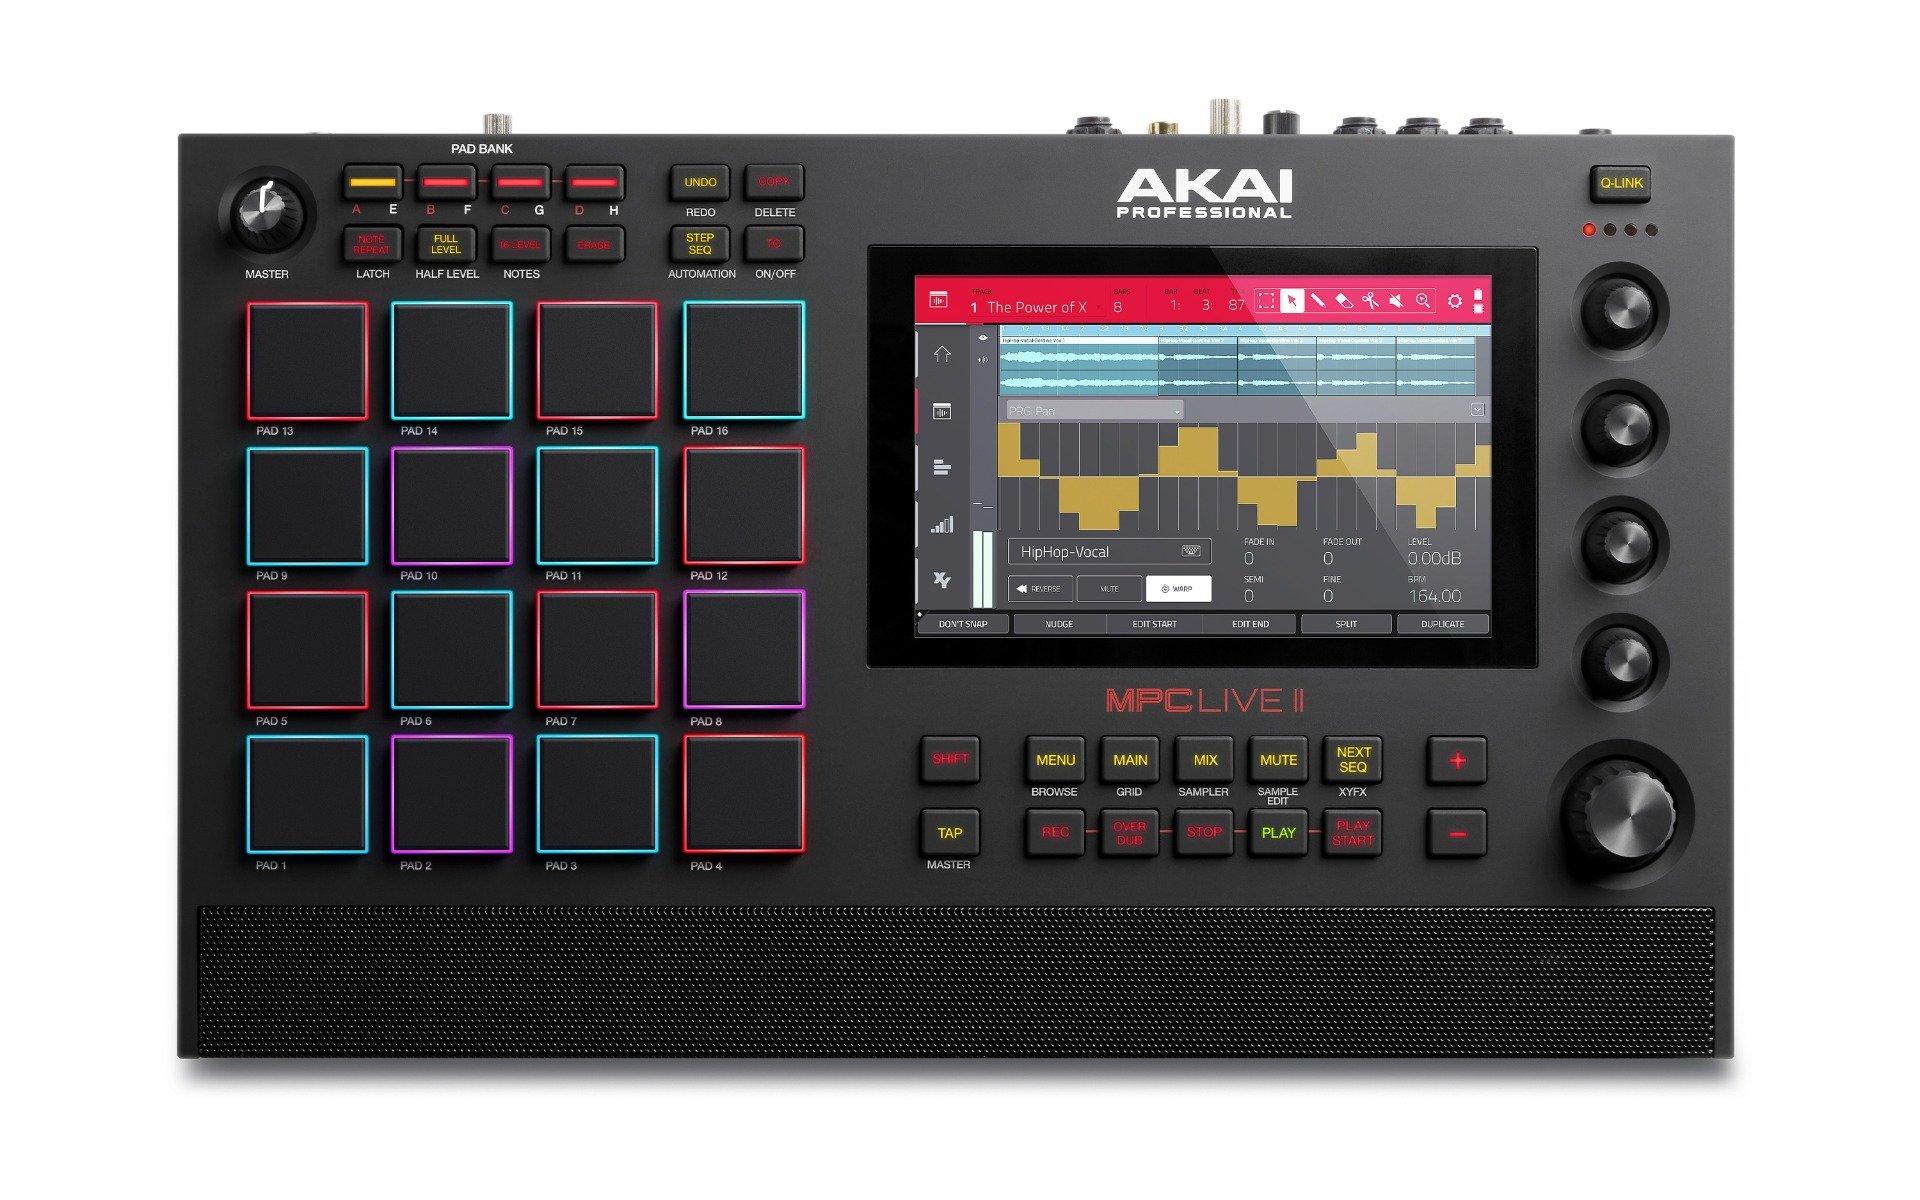 Akai MPC Live II Standalone Sampler/Sequencer